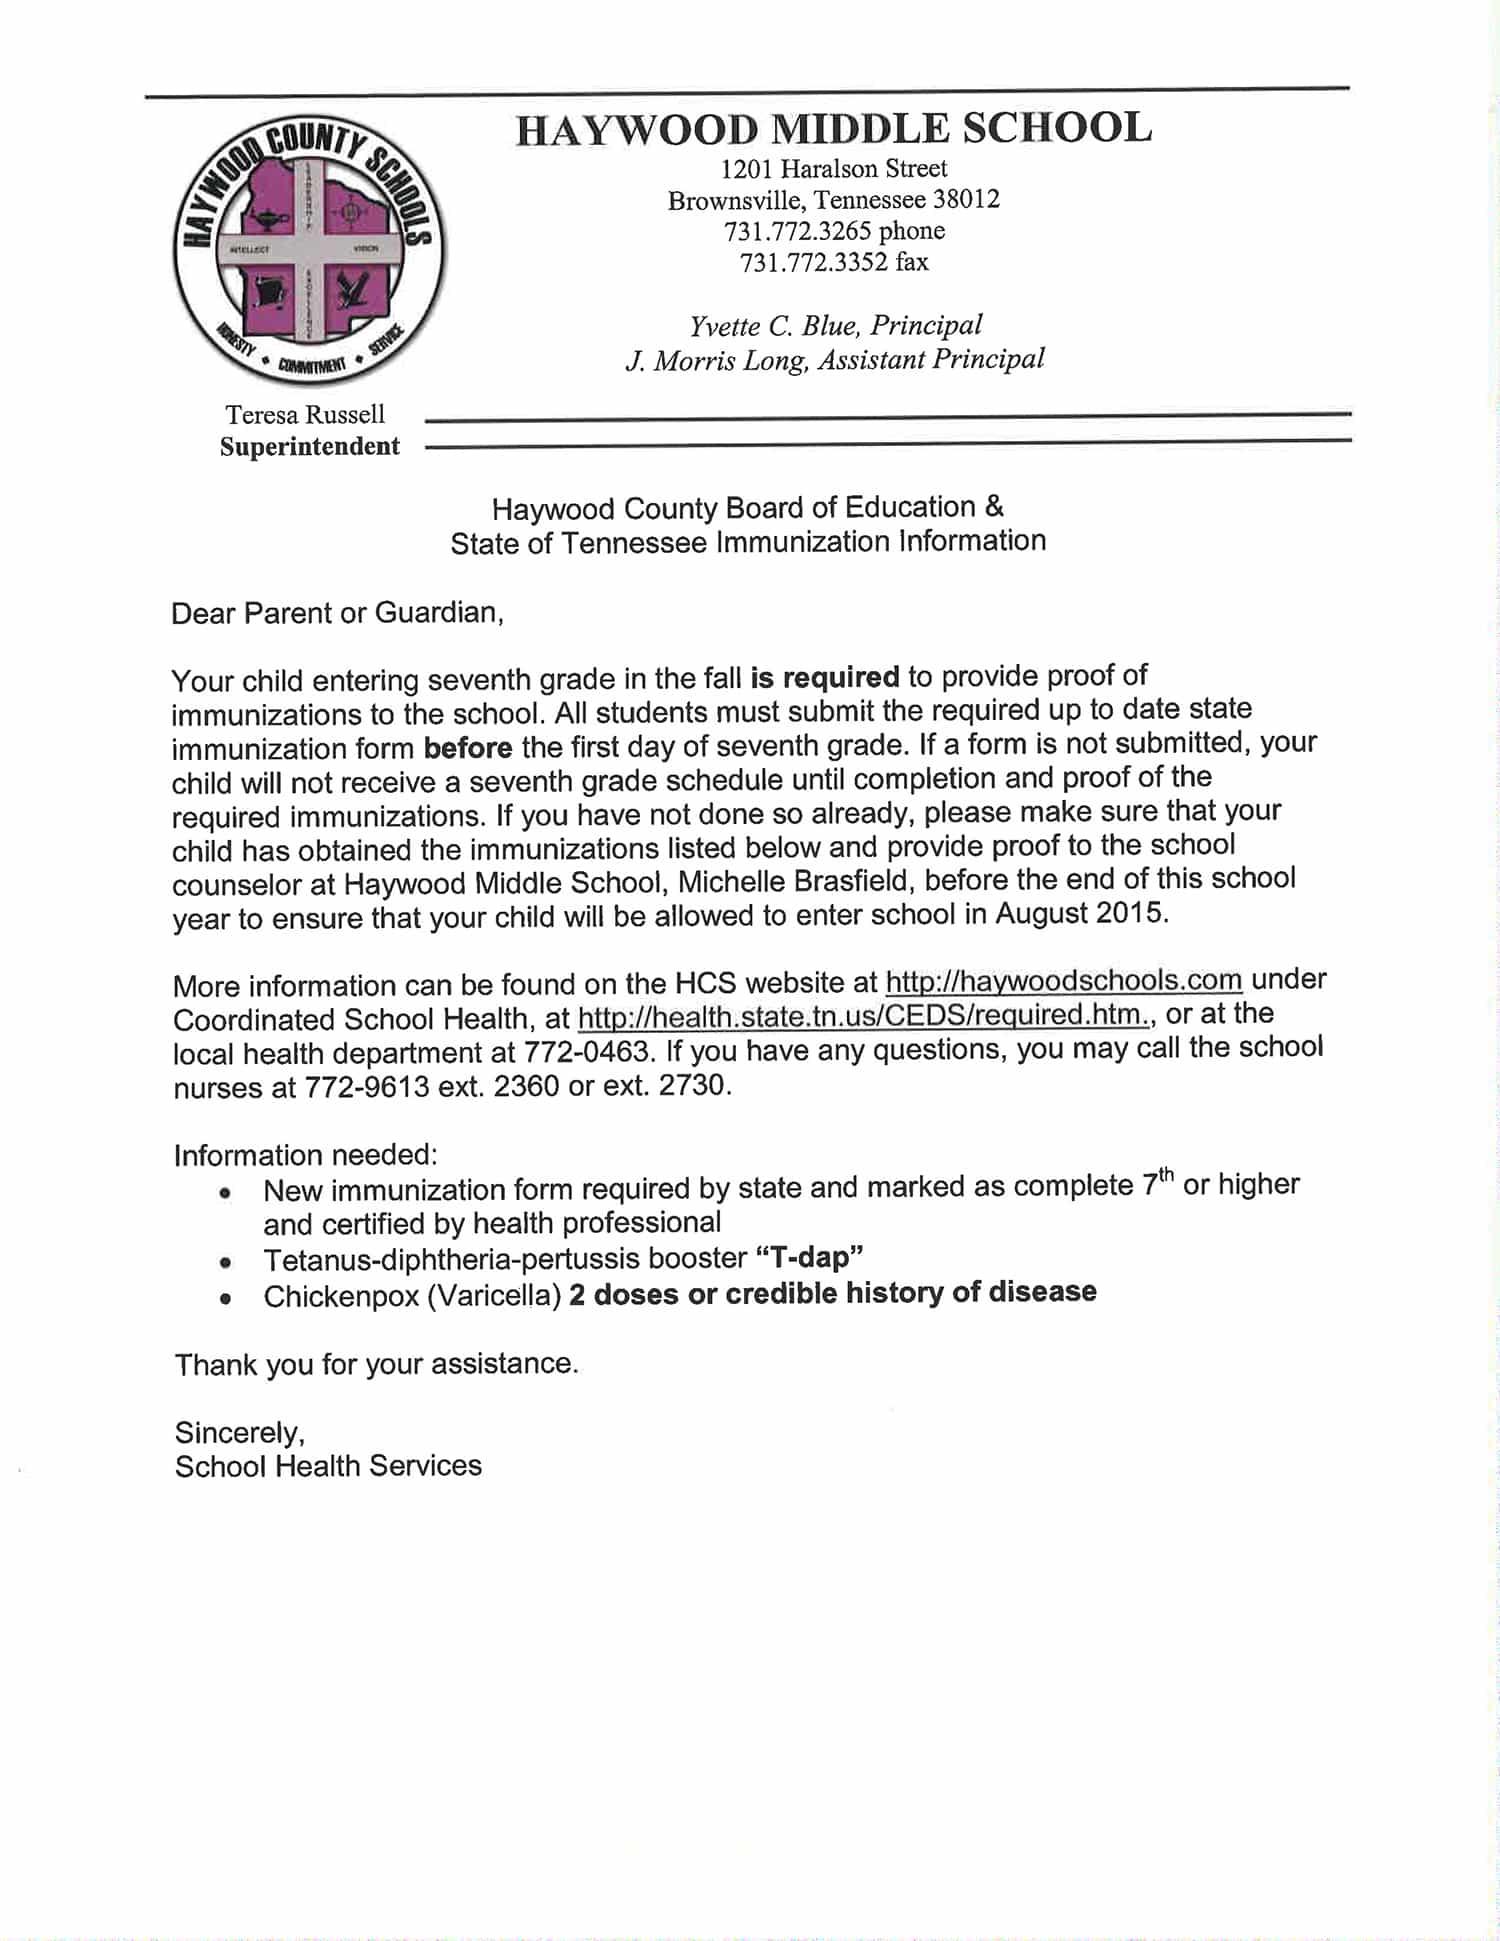 Immunizations Letter - Grade 7 (1)-1